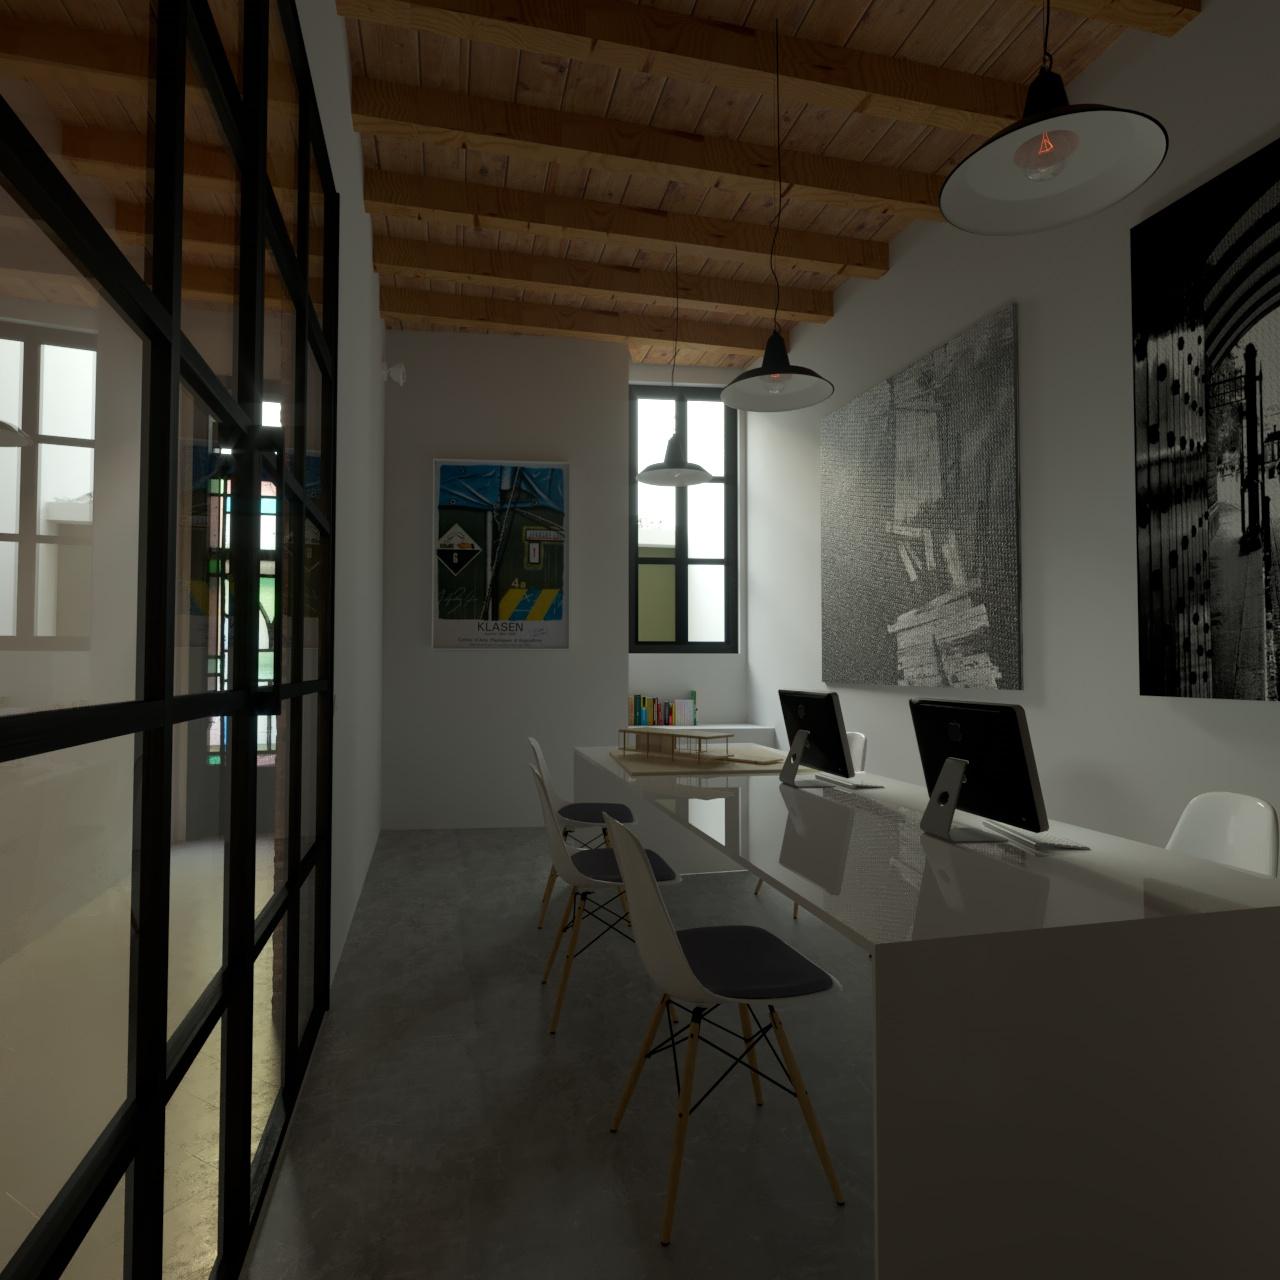 Studio tecnico 04